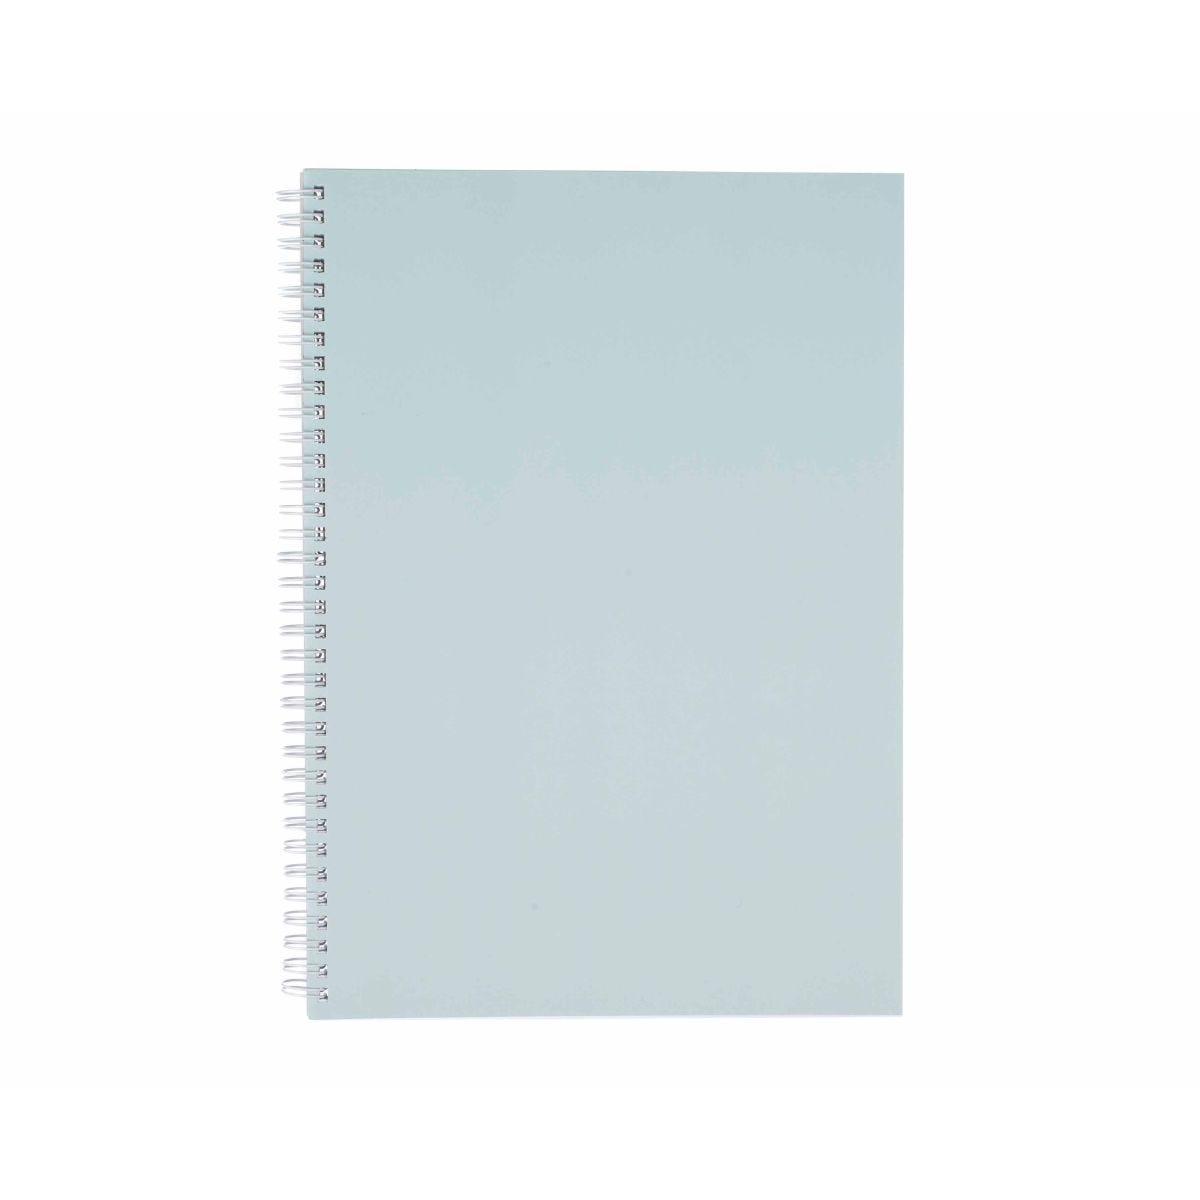 64eae429a398 Notebooks & Notepads | Ryman® UK